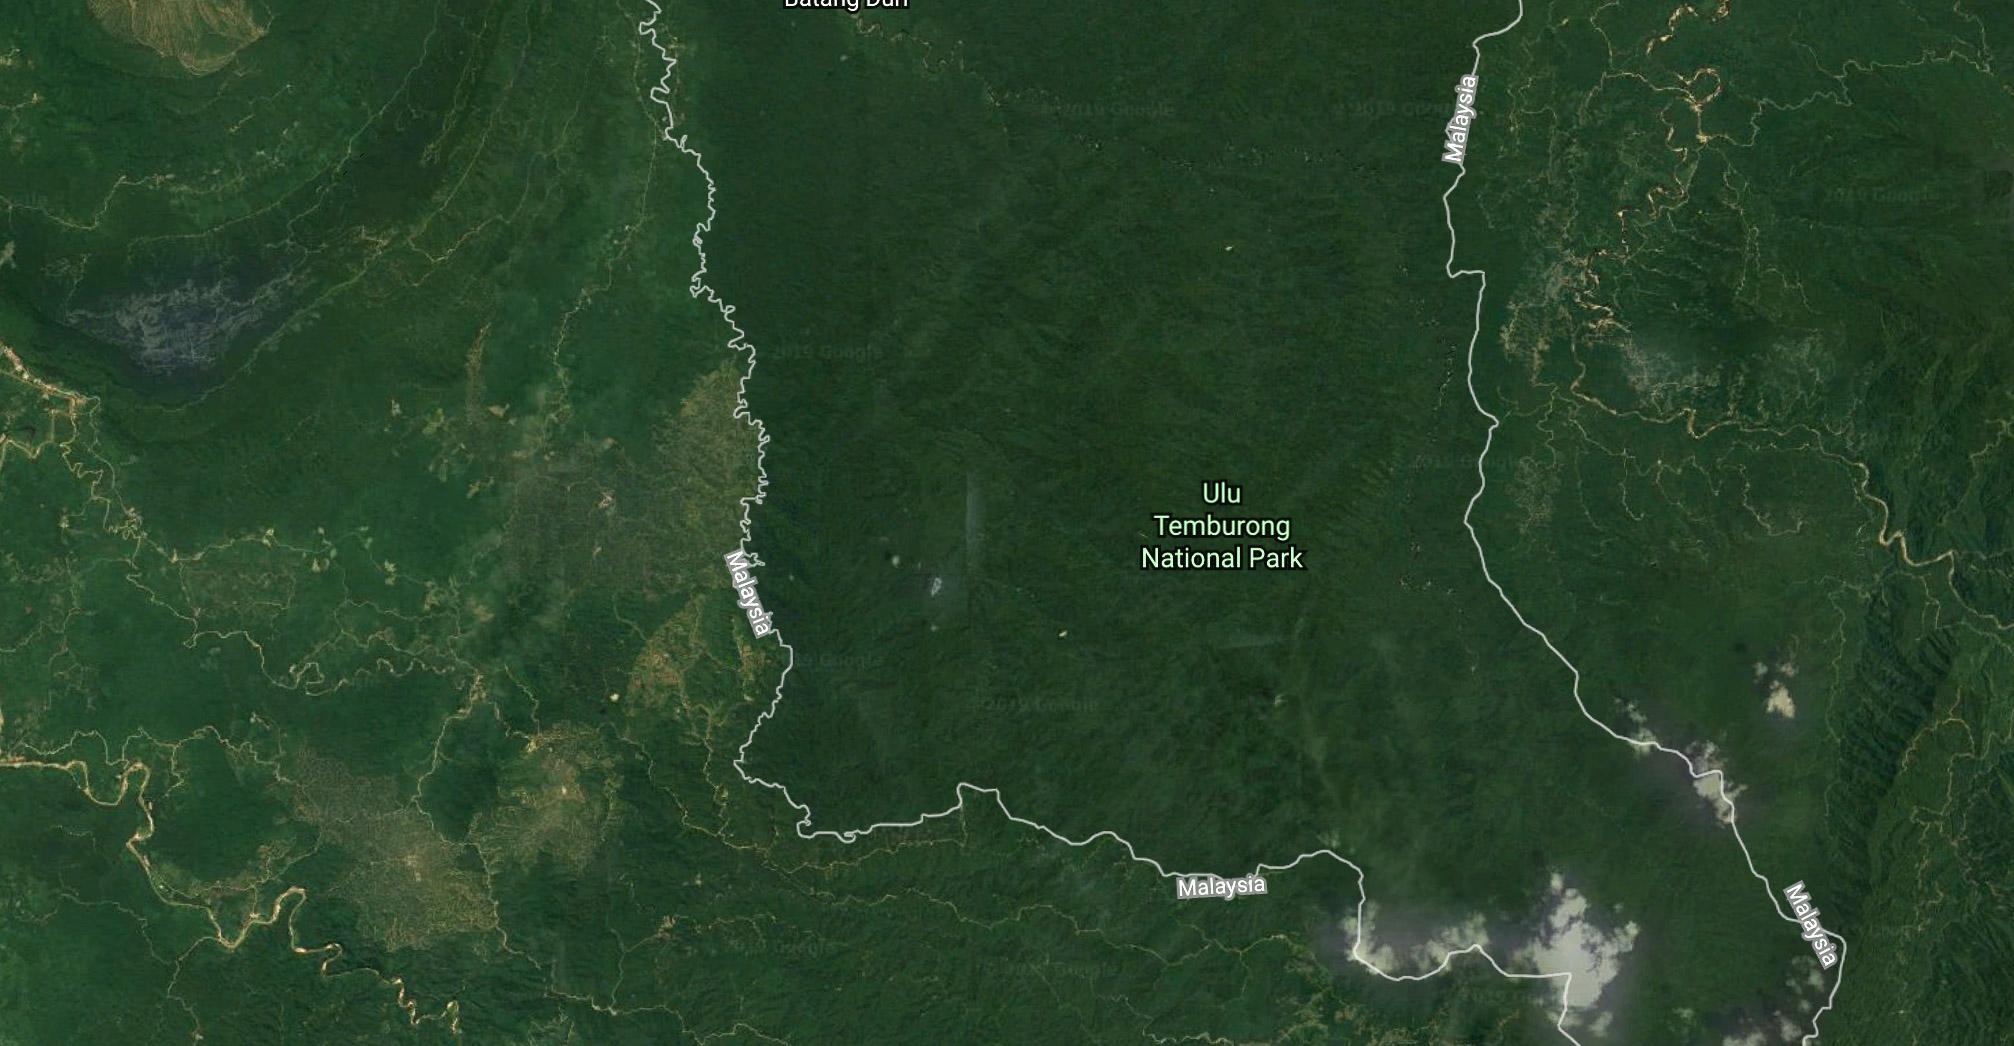 Ulu Temburong Google Earth 1.jpg